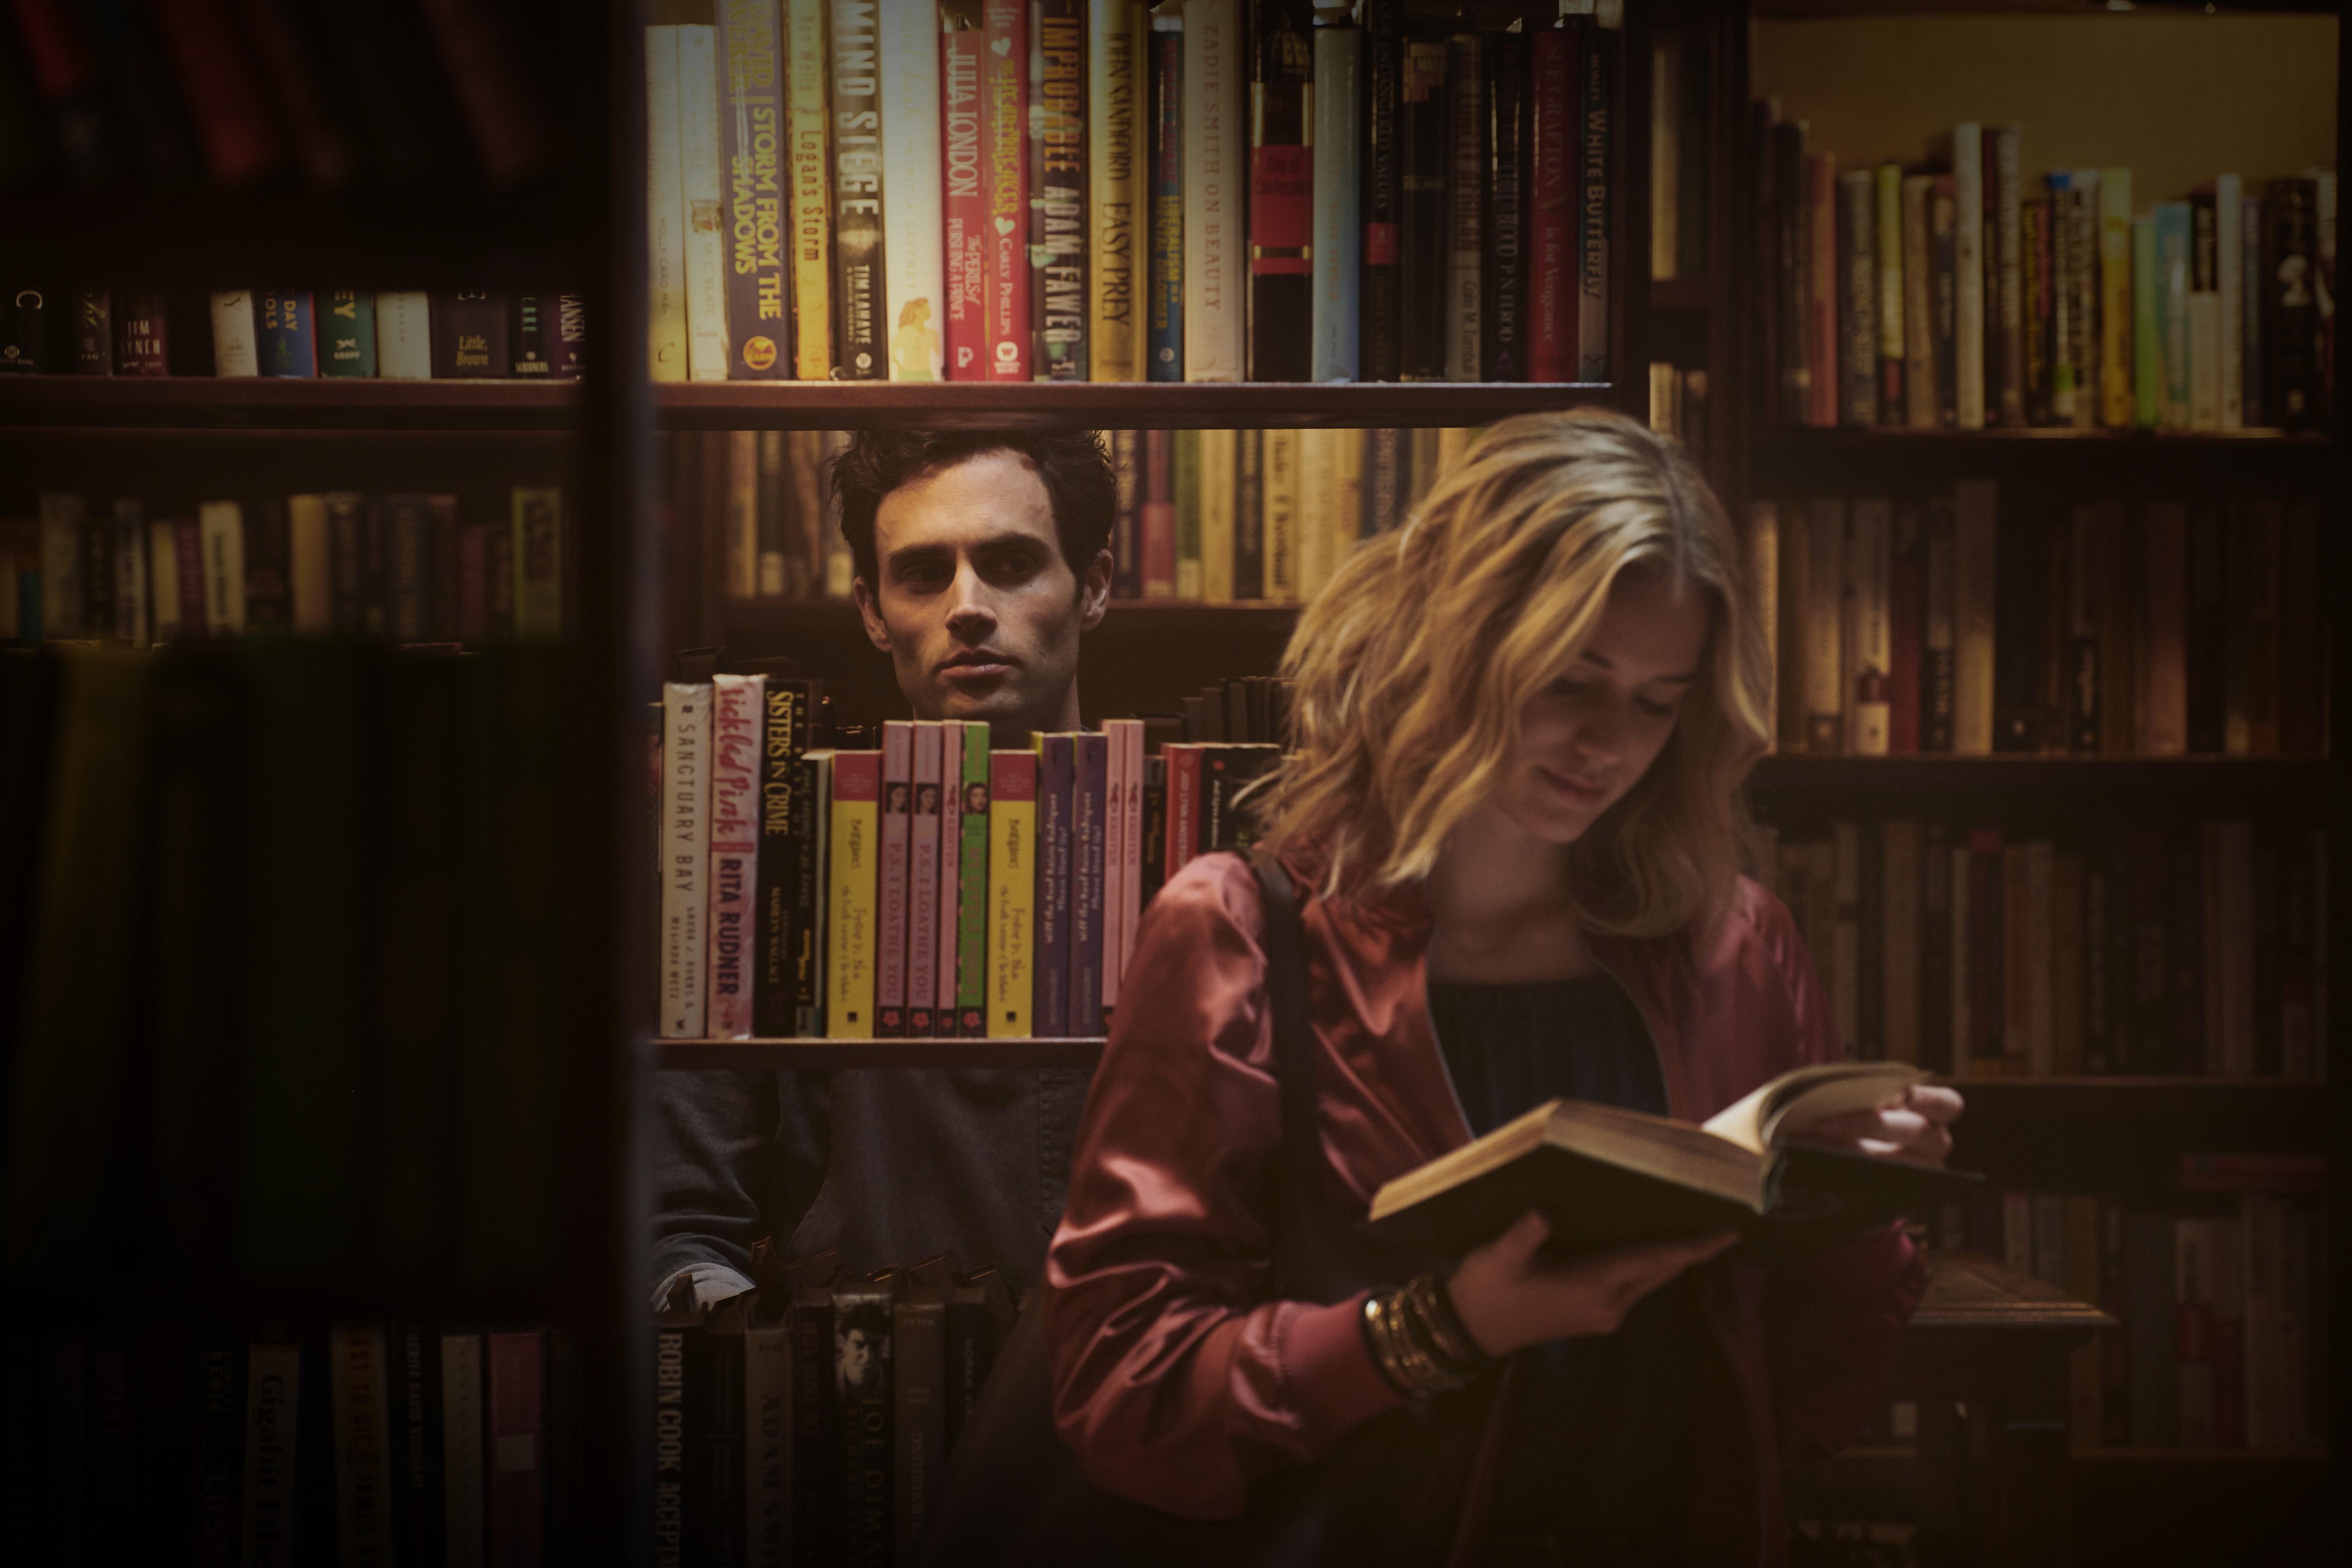 Bedroom Eyes Full Movie 2017 you (lifetime) review: addictive stalker drama is dangerous